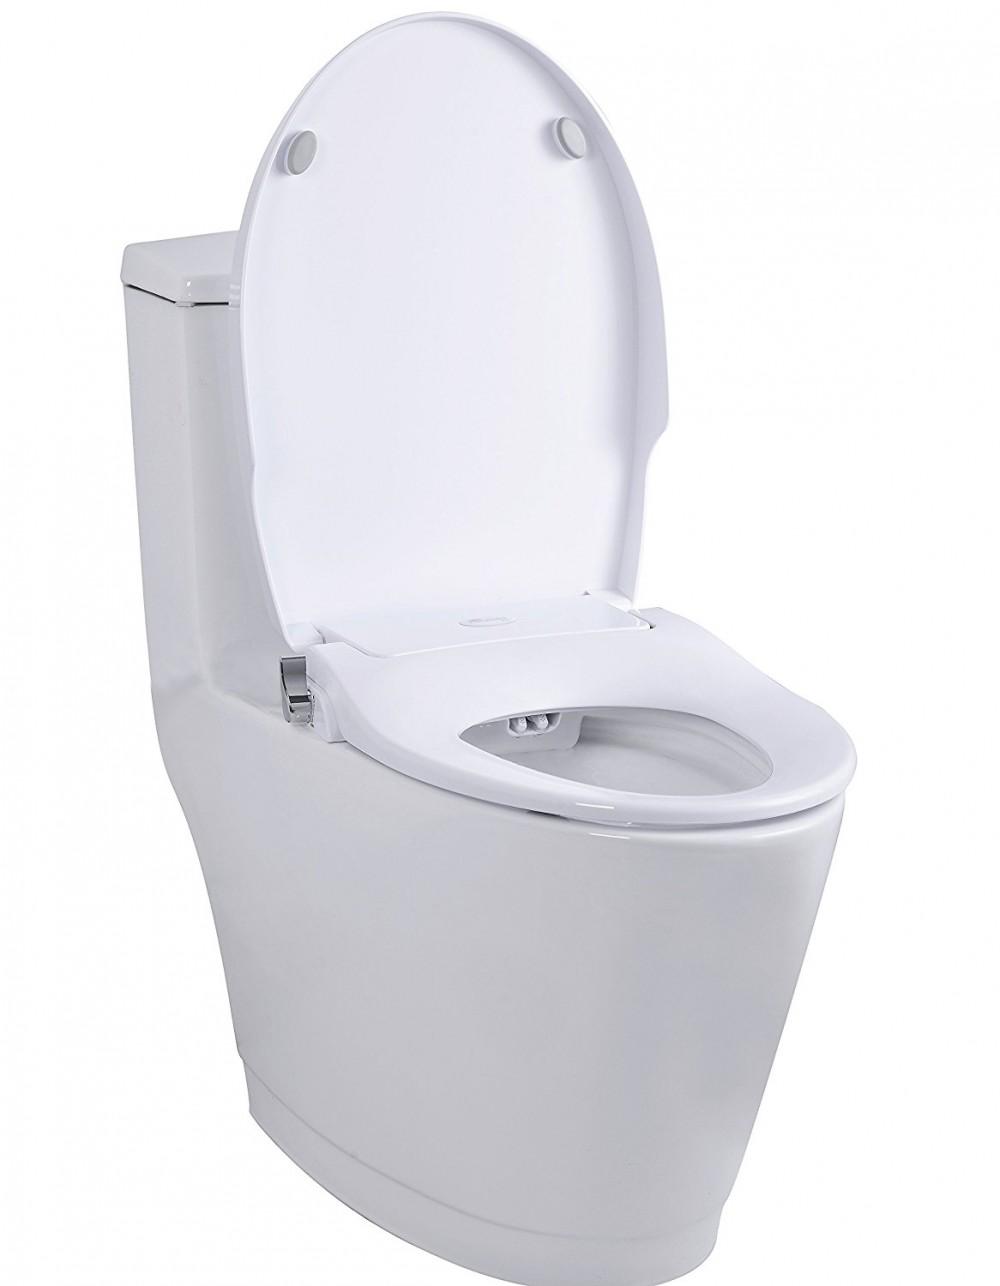 maro fp106 manual bidet seat